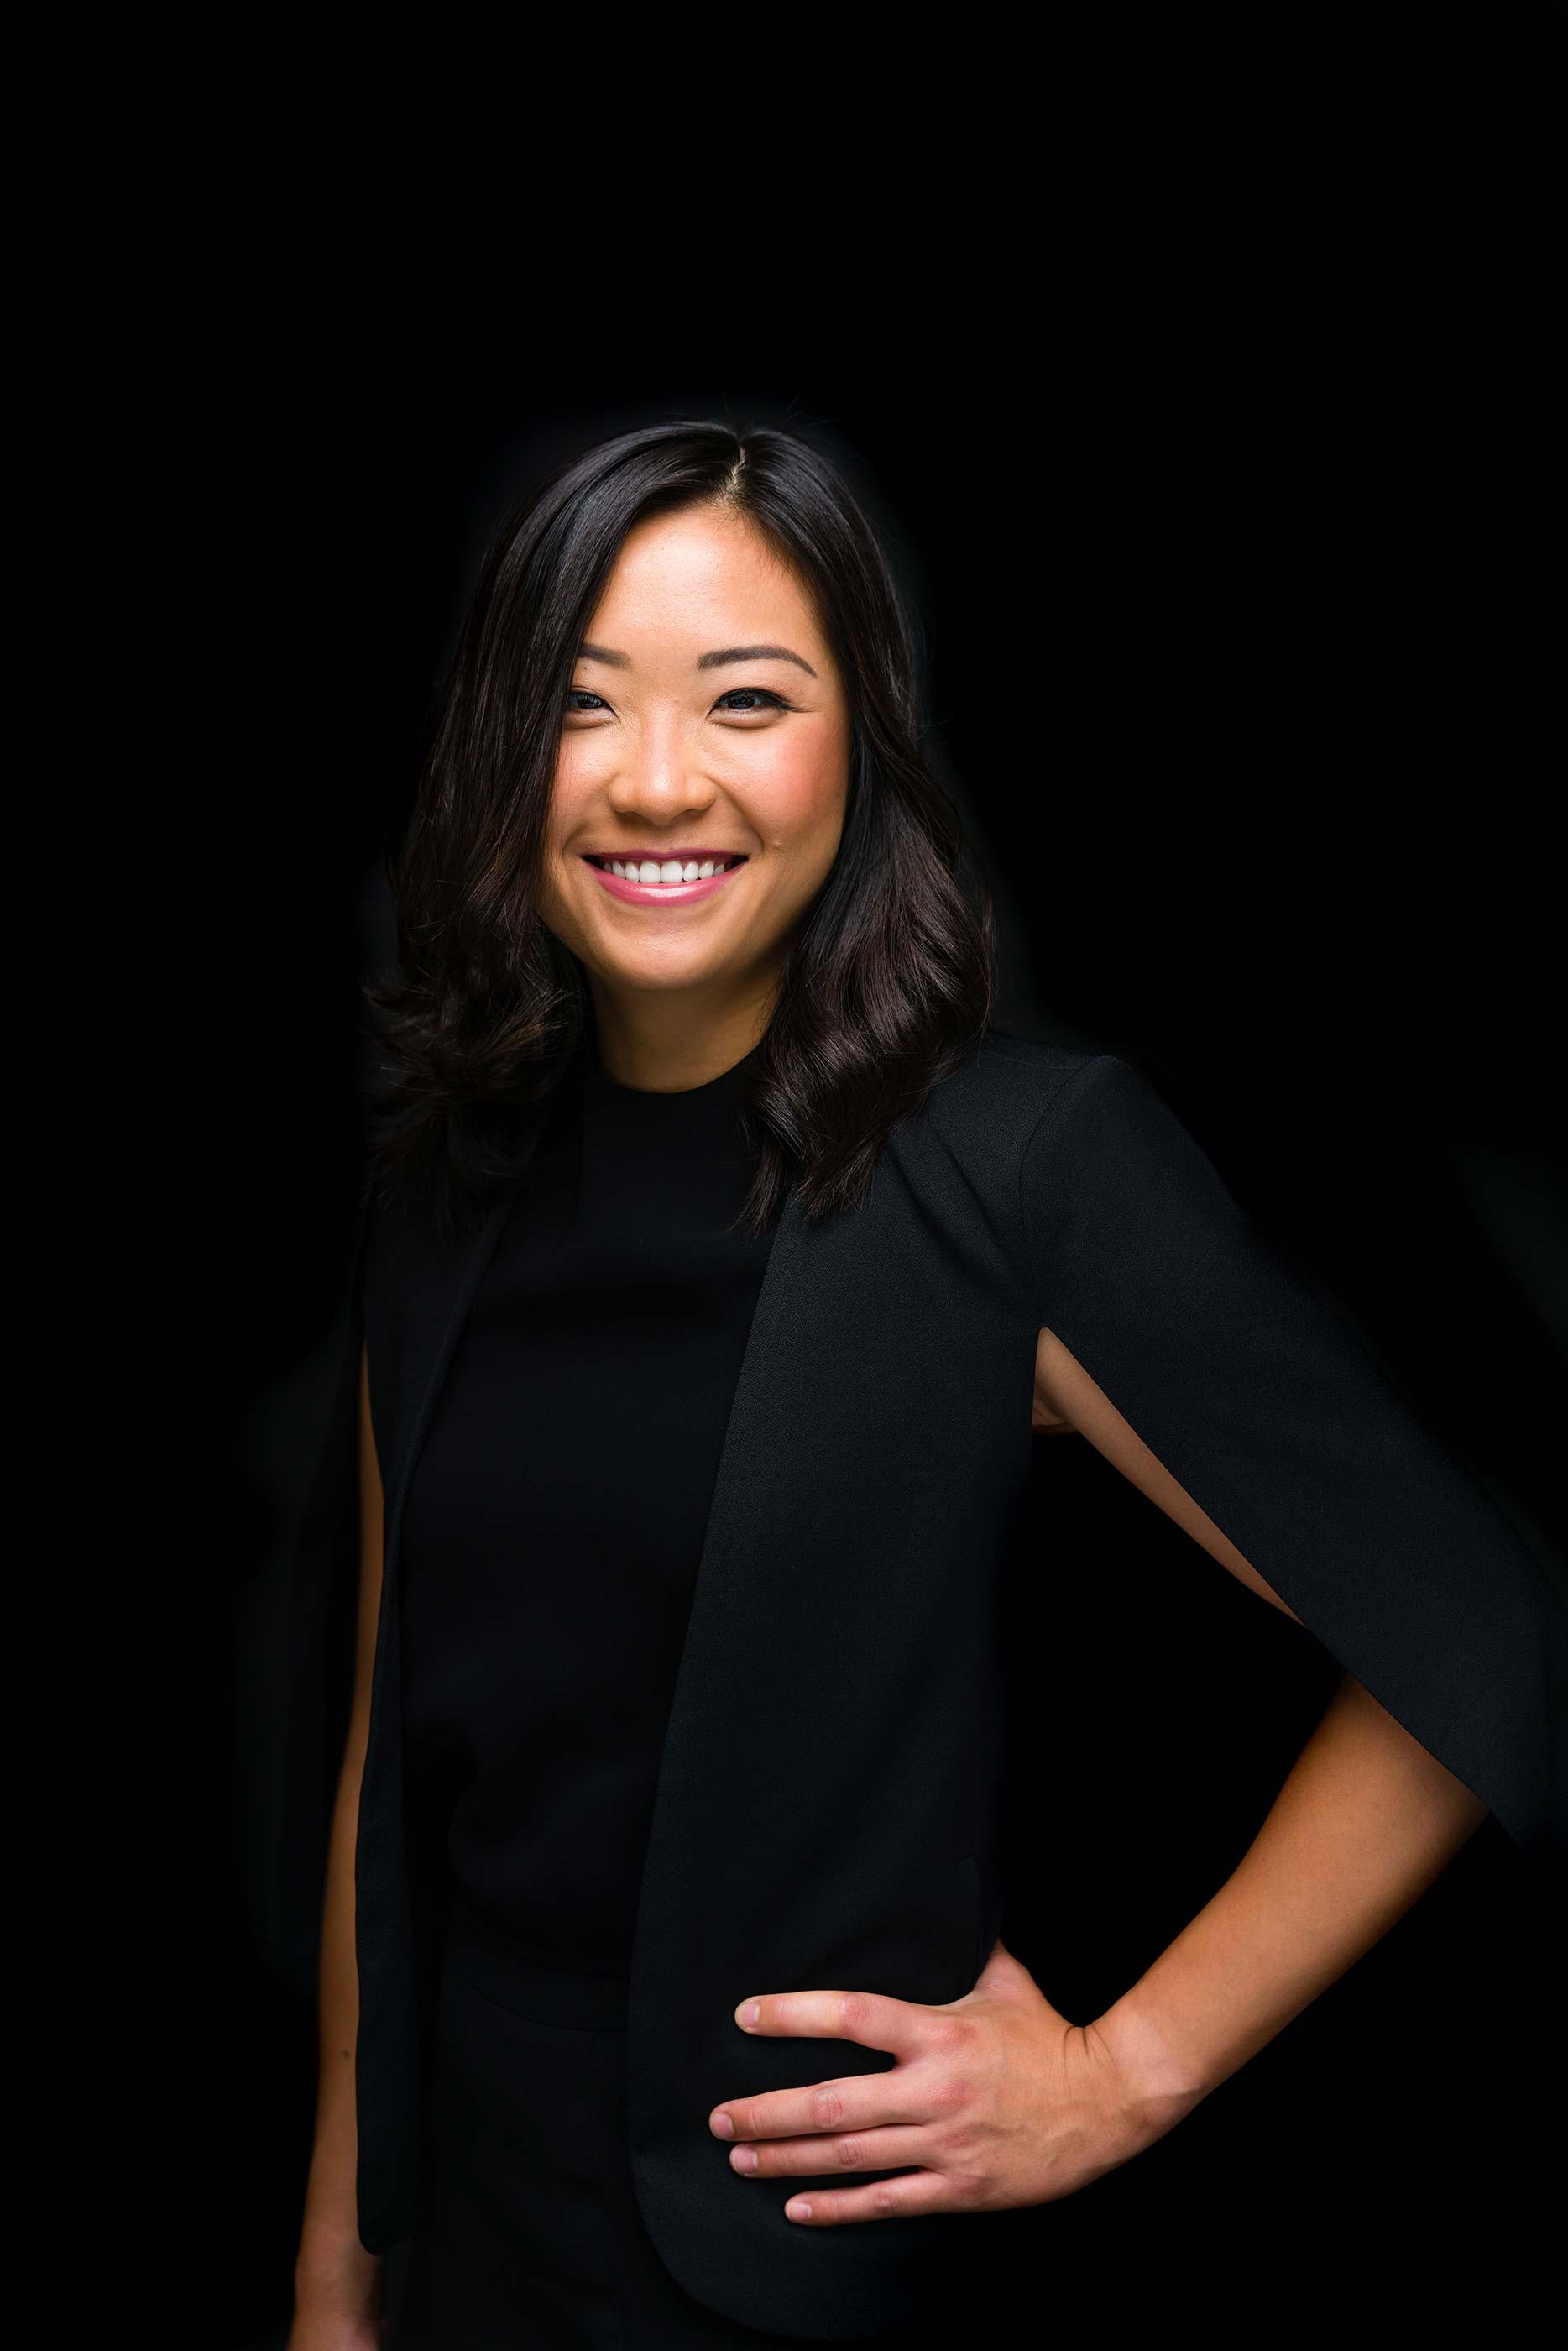 Studio Headshot Portrait Photography